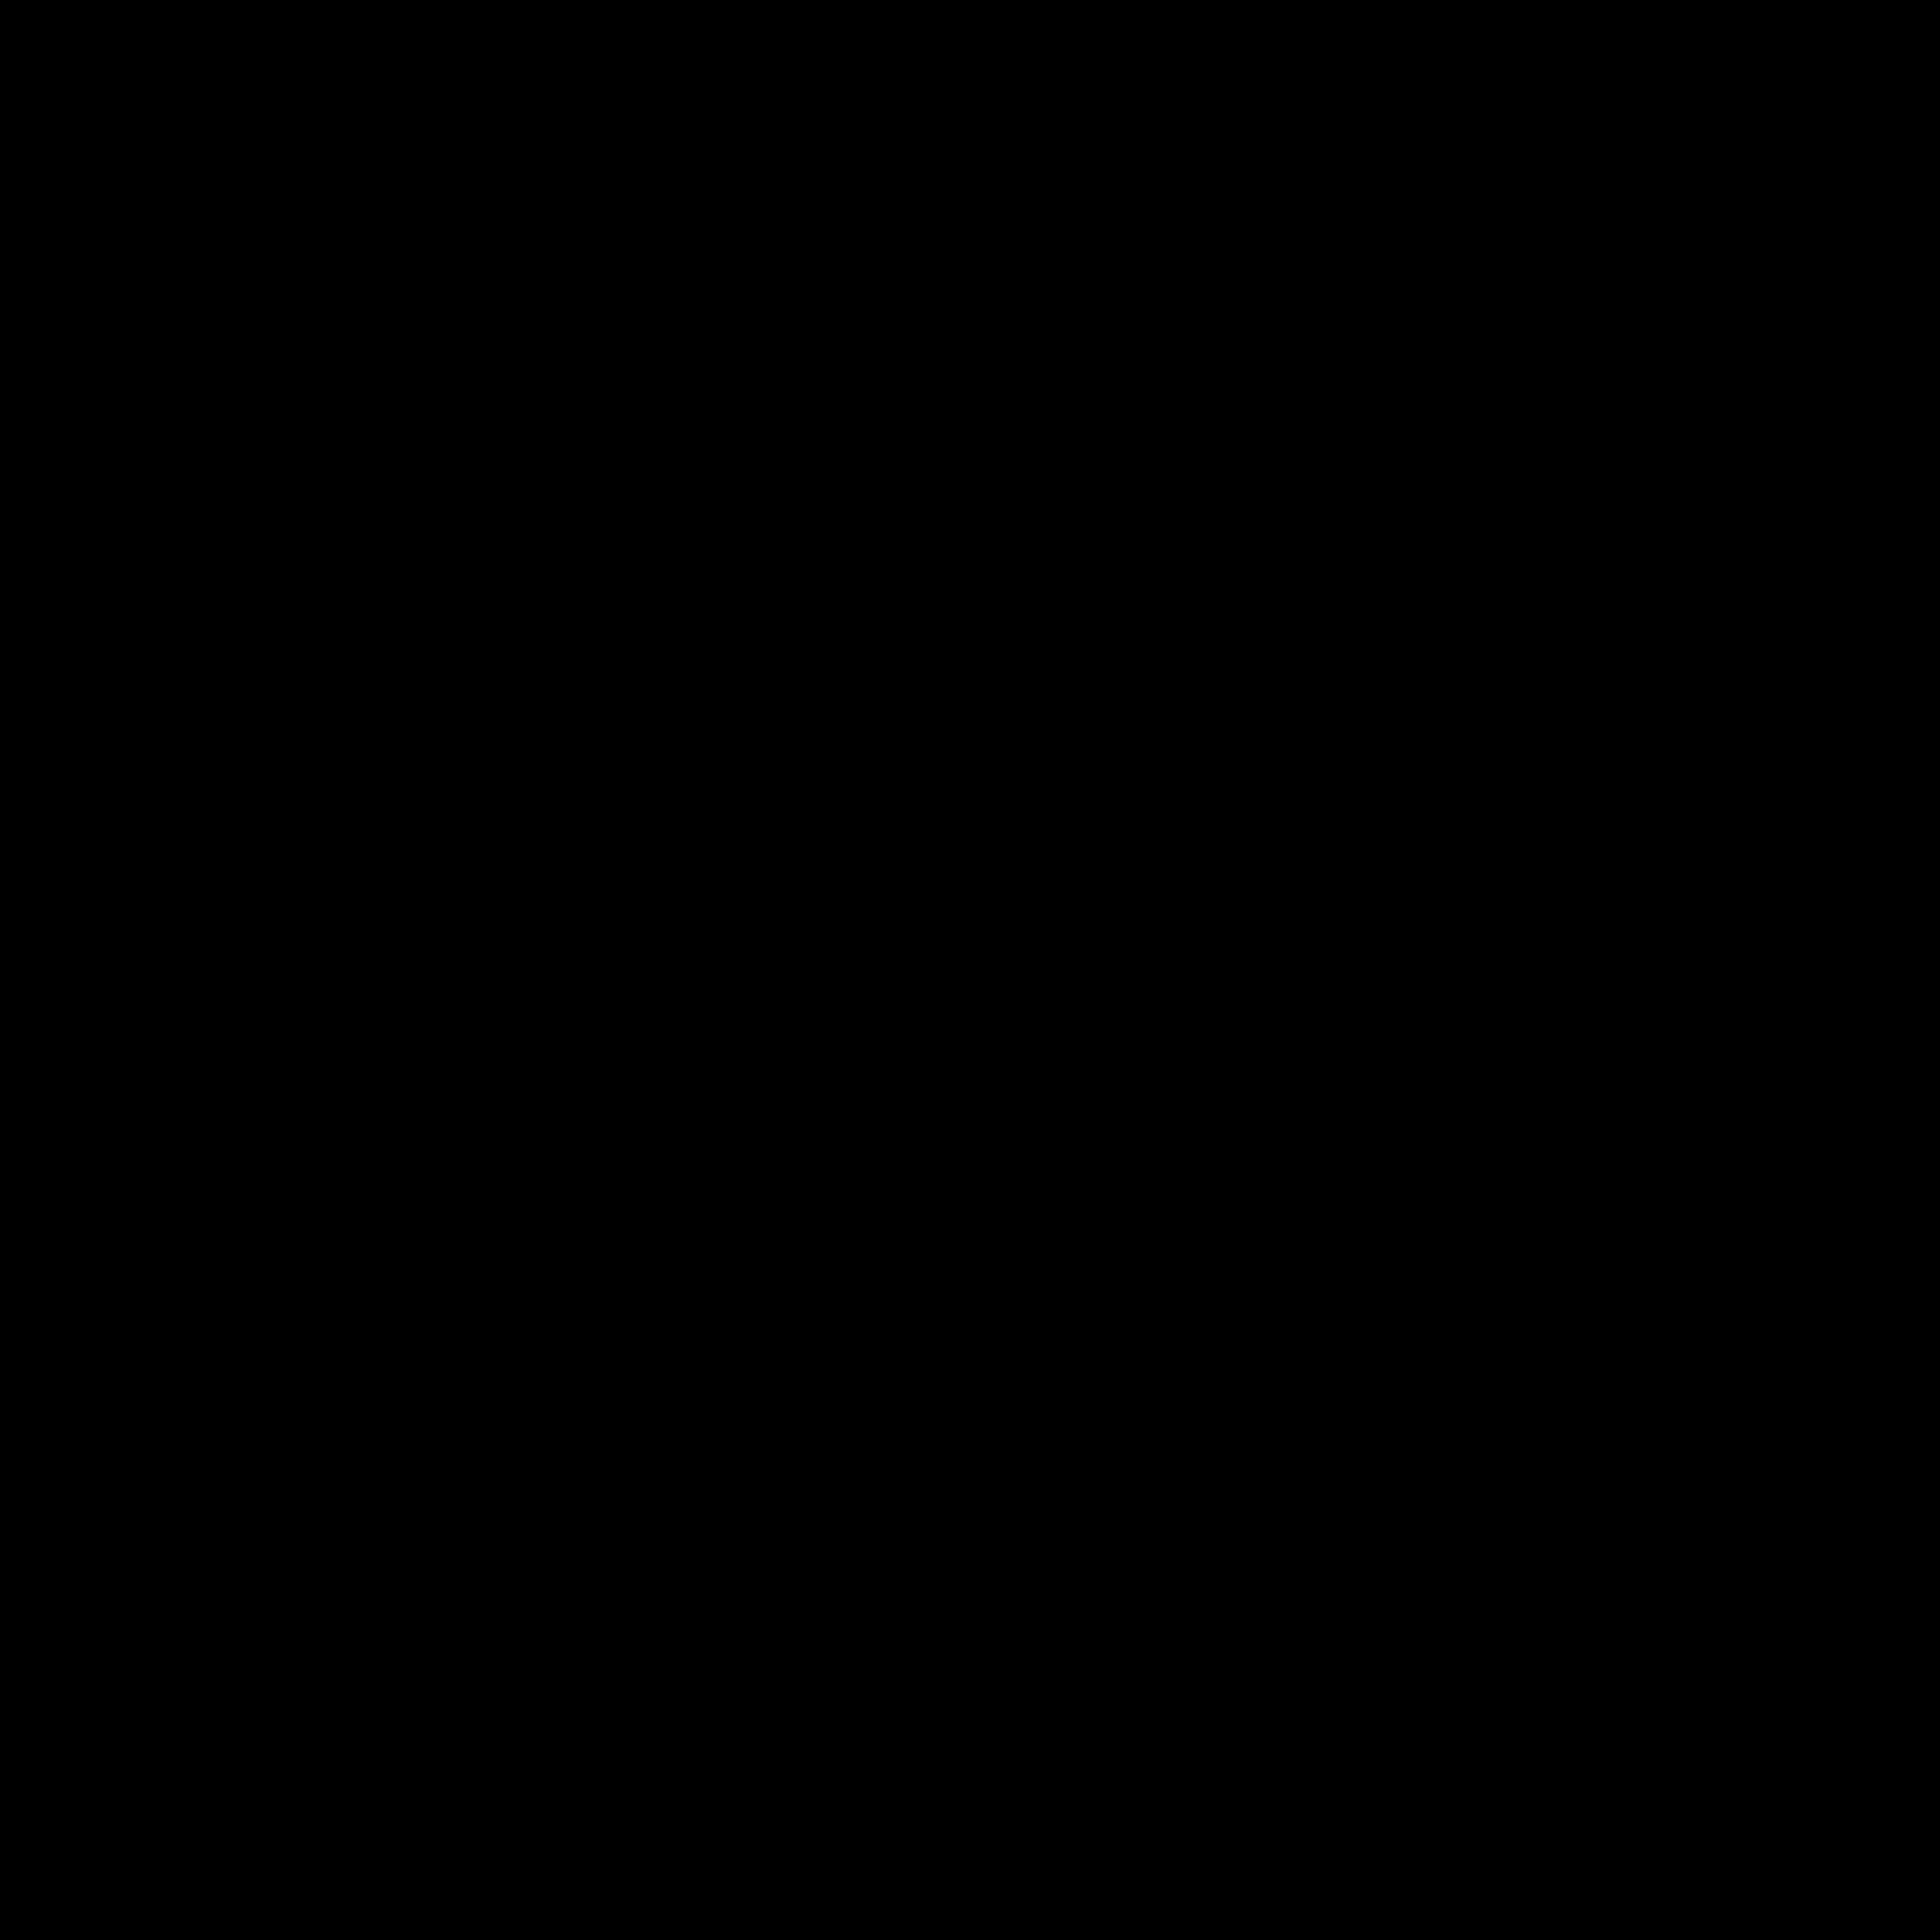 logocambientalbackb